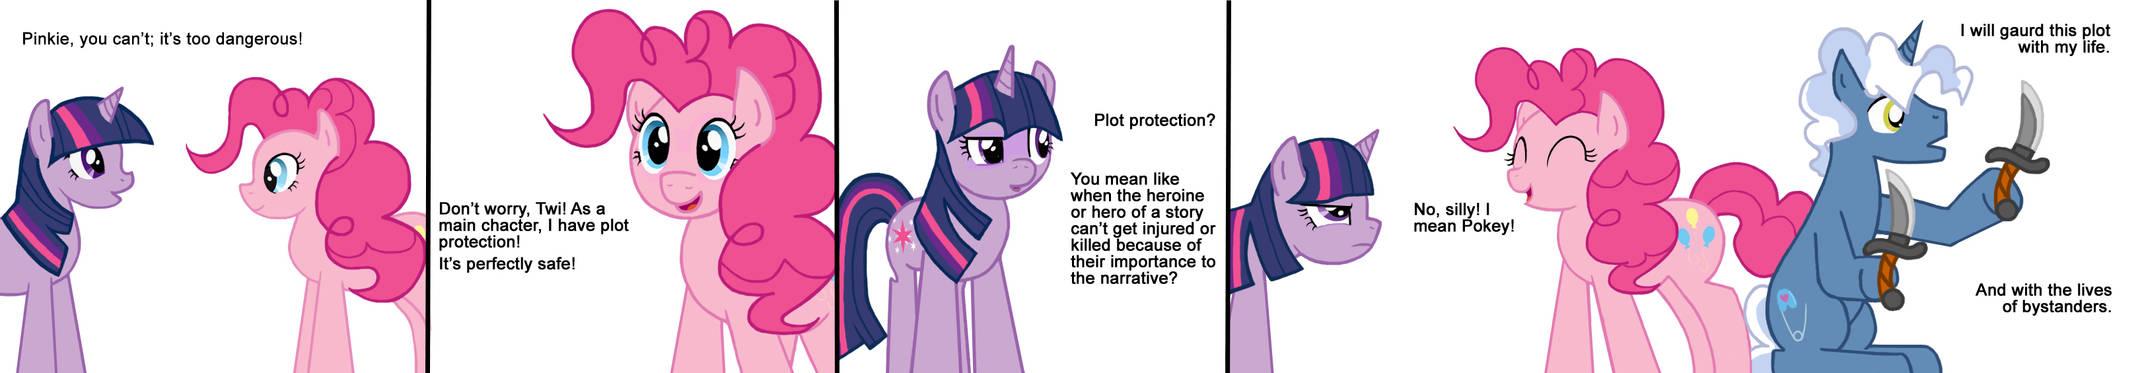 Plot Protection